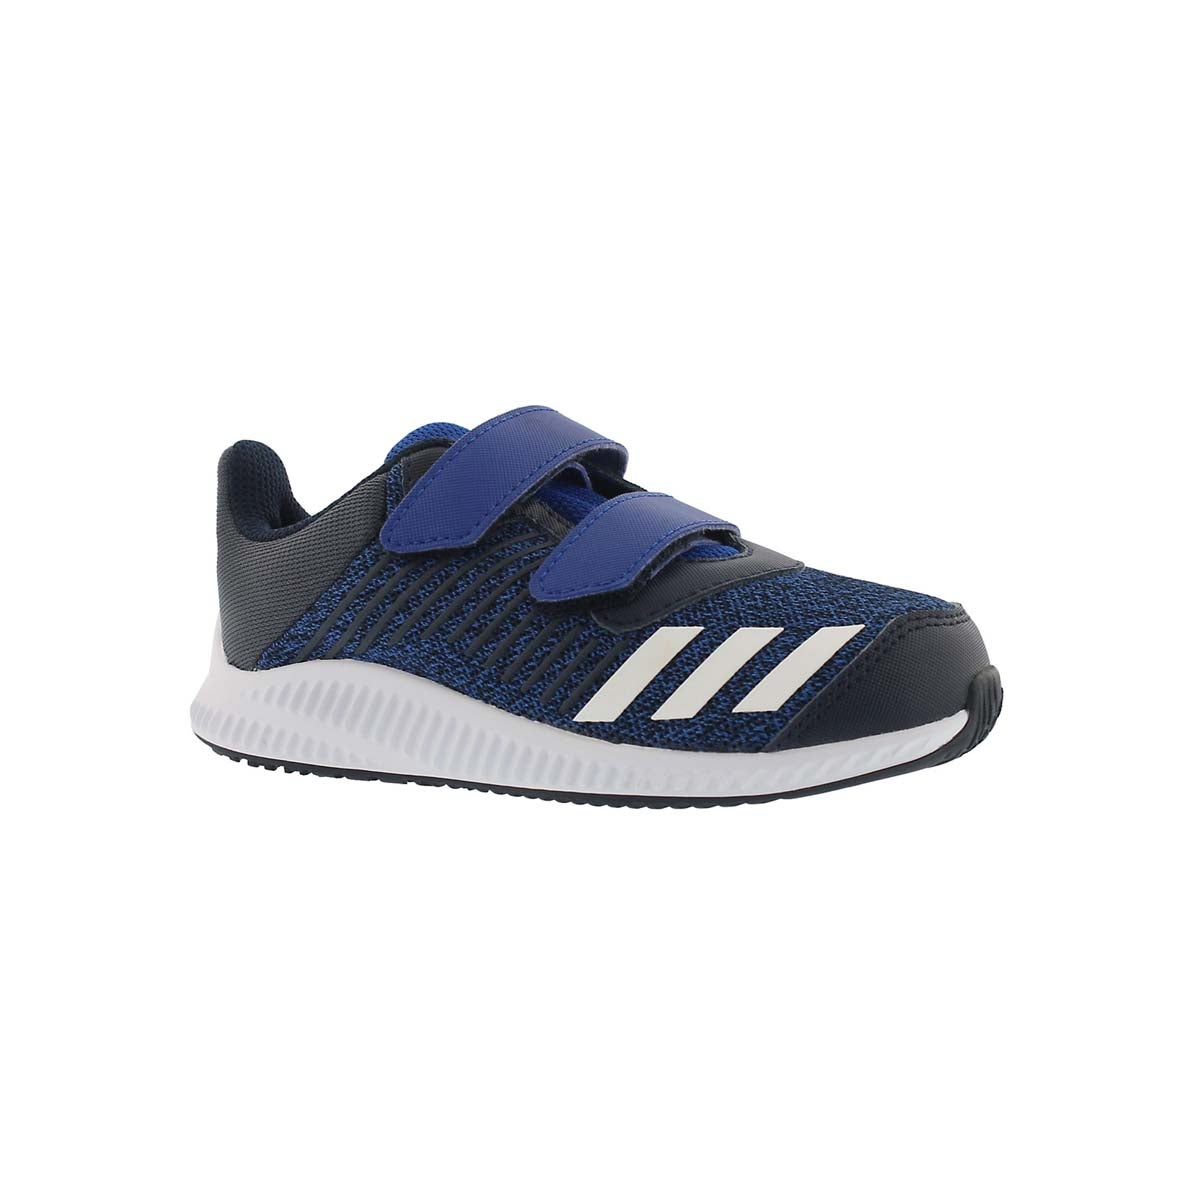 Infants' FORTA RUN CF navy/white sneakers